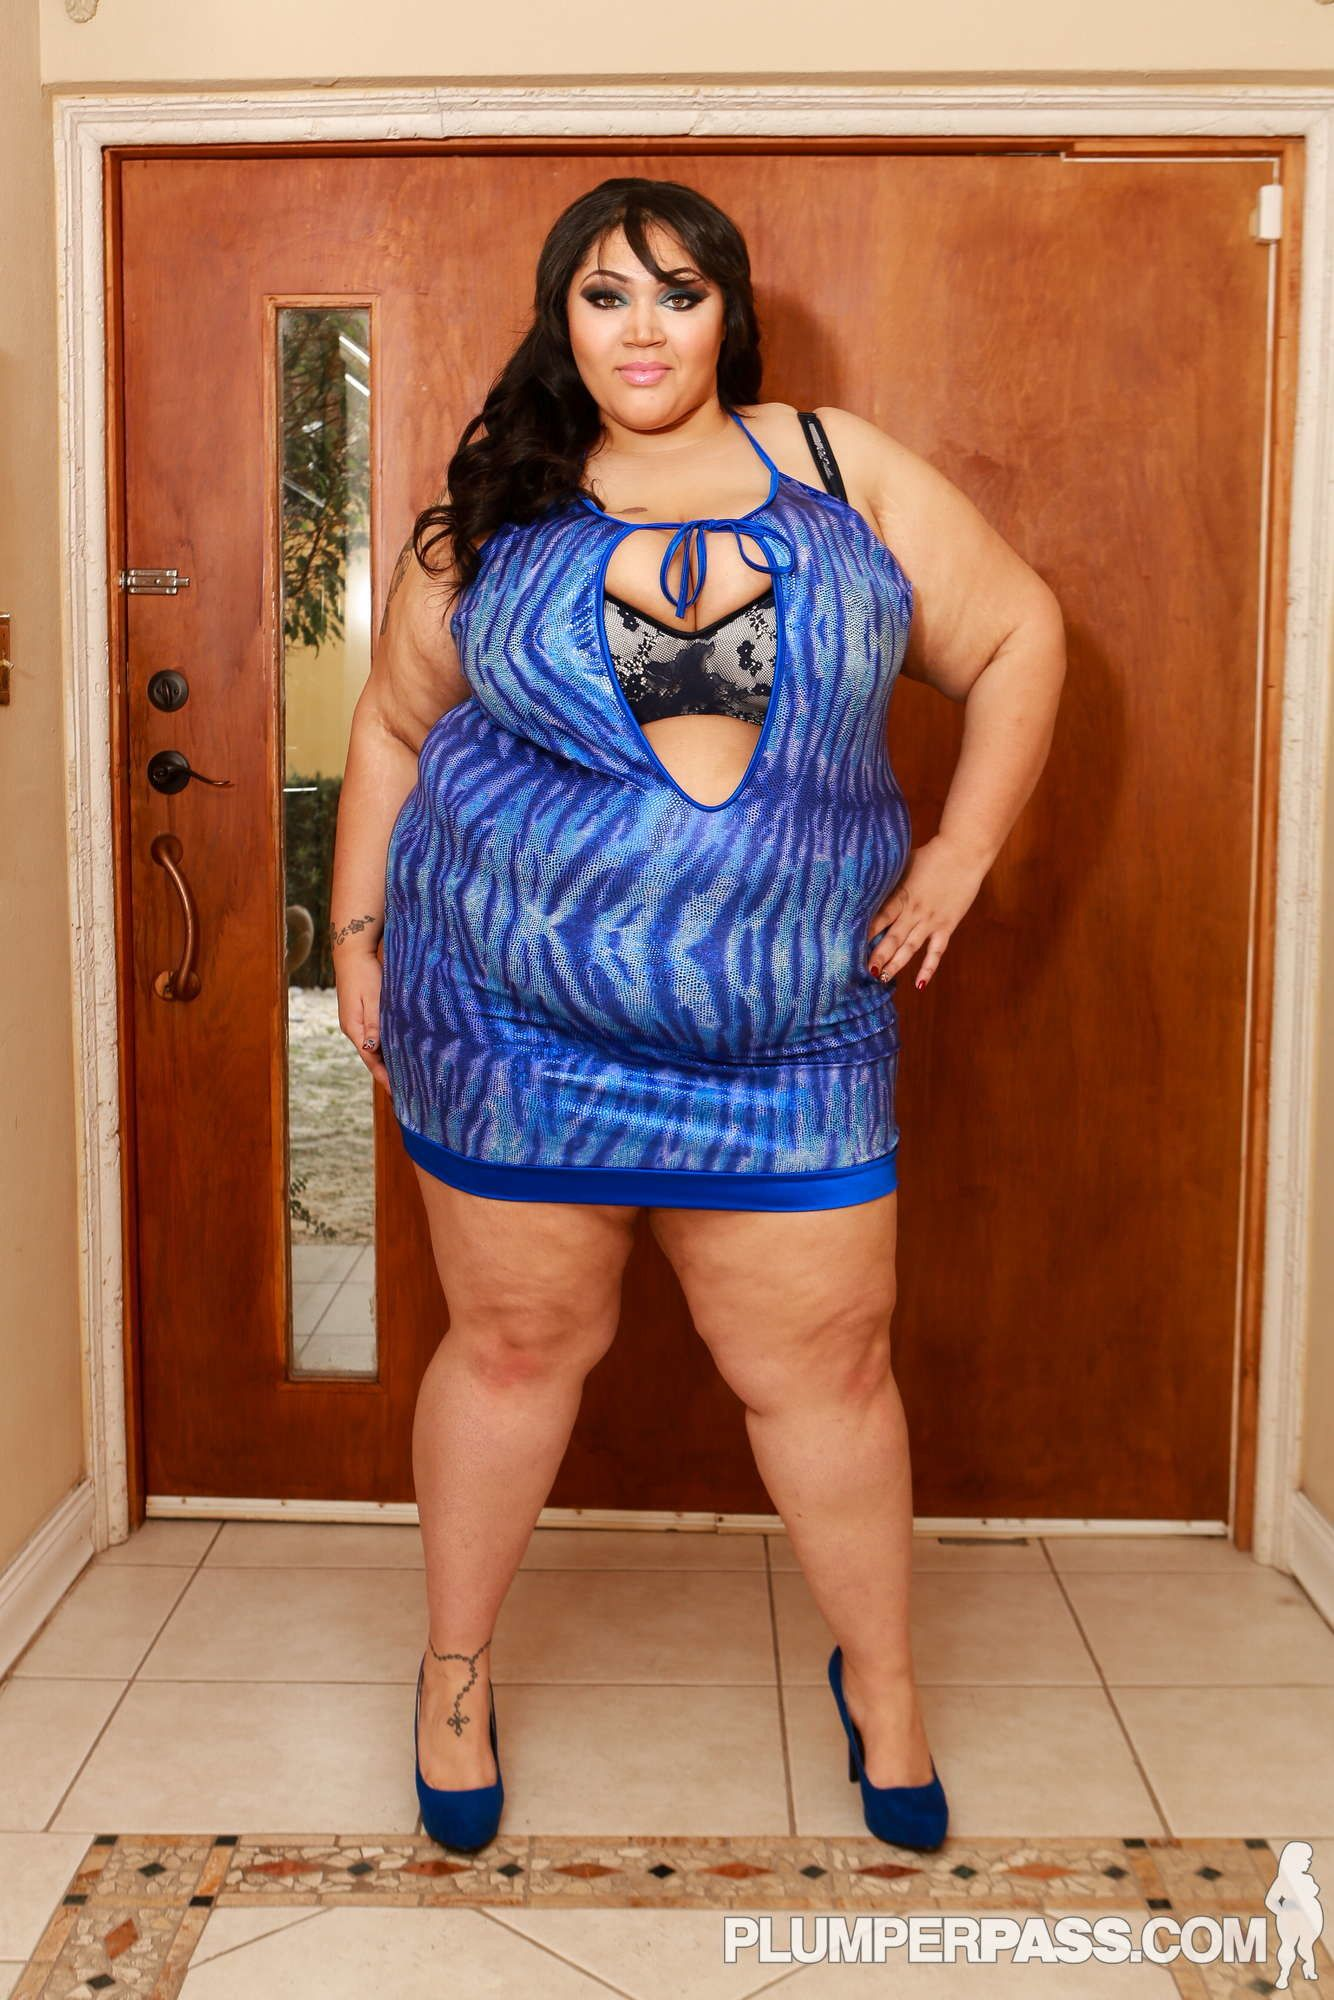 Bbw Tall Curvy Woman G